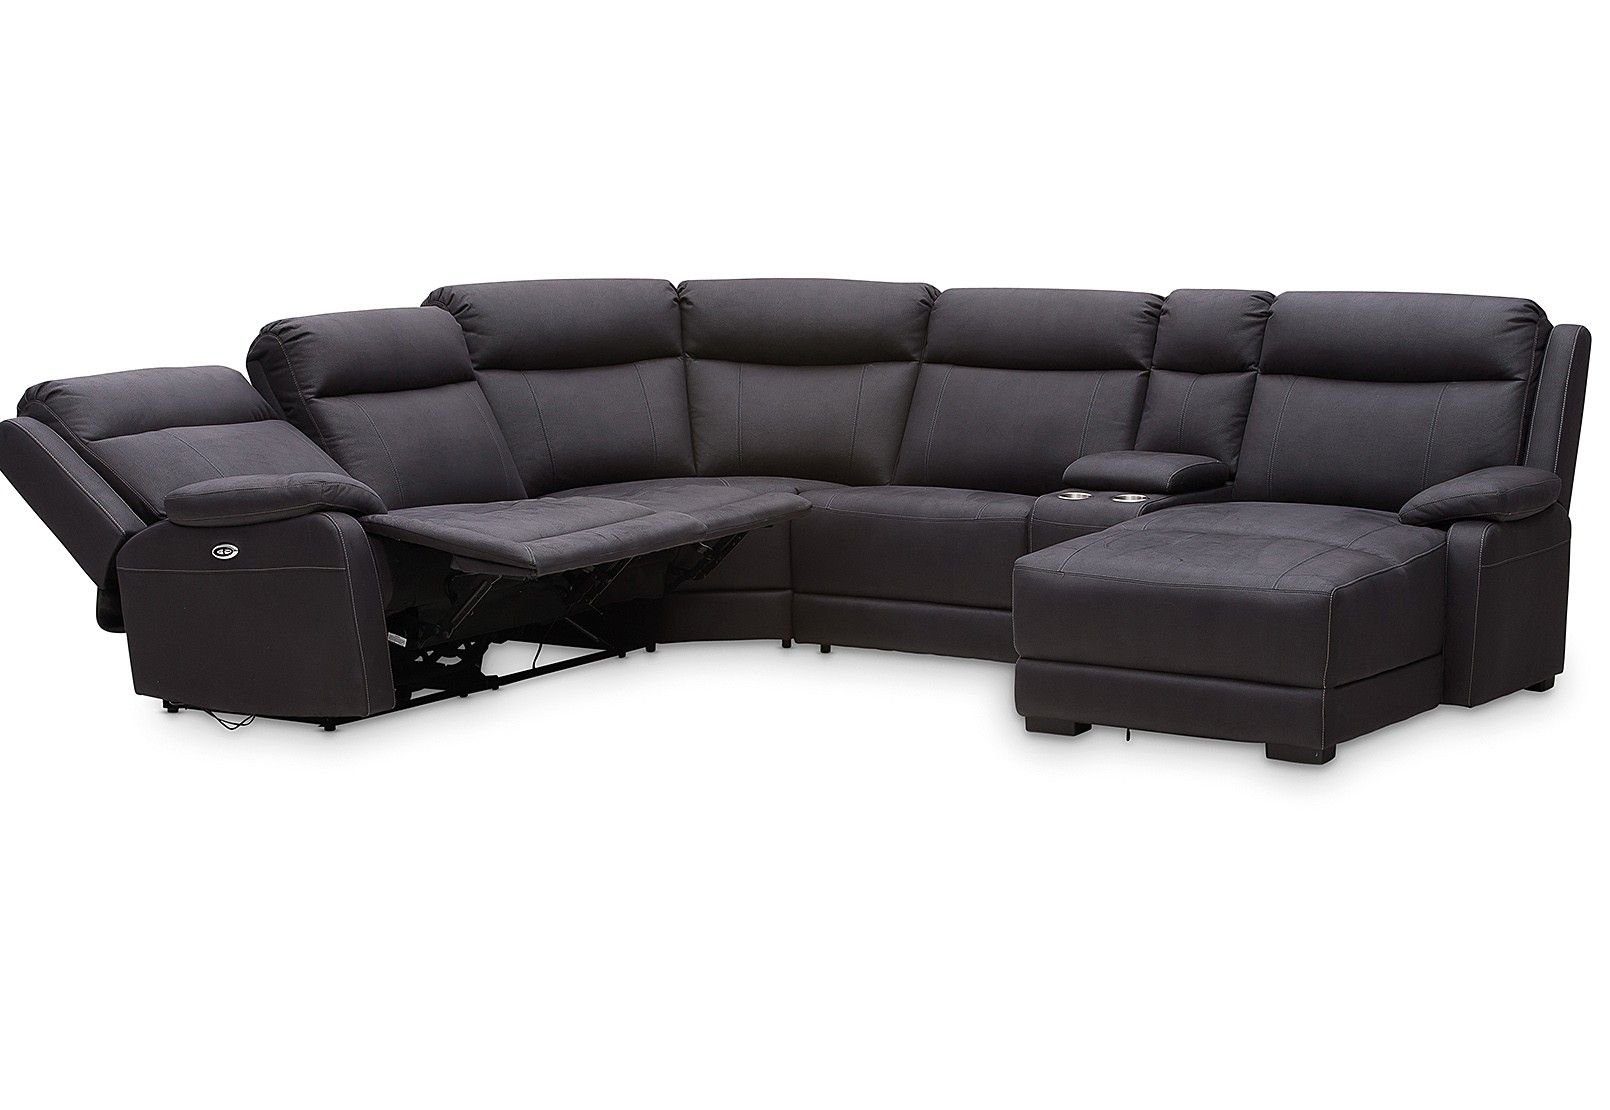 Corner Lounge Sofa Bed Recliner Fabric Cleaning Machine Gradschoolfairs